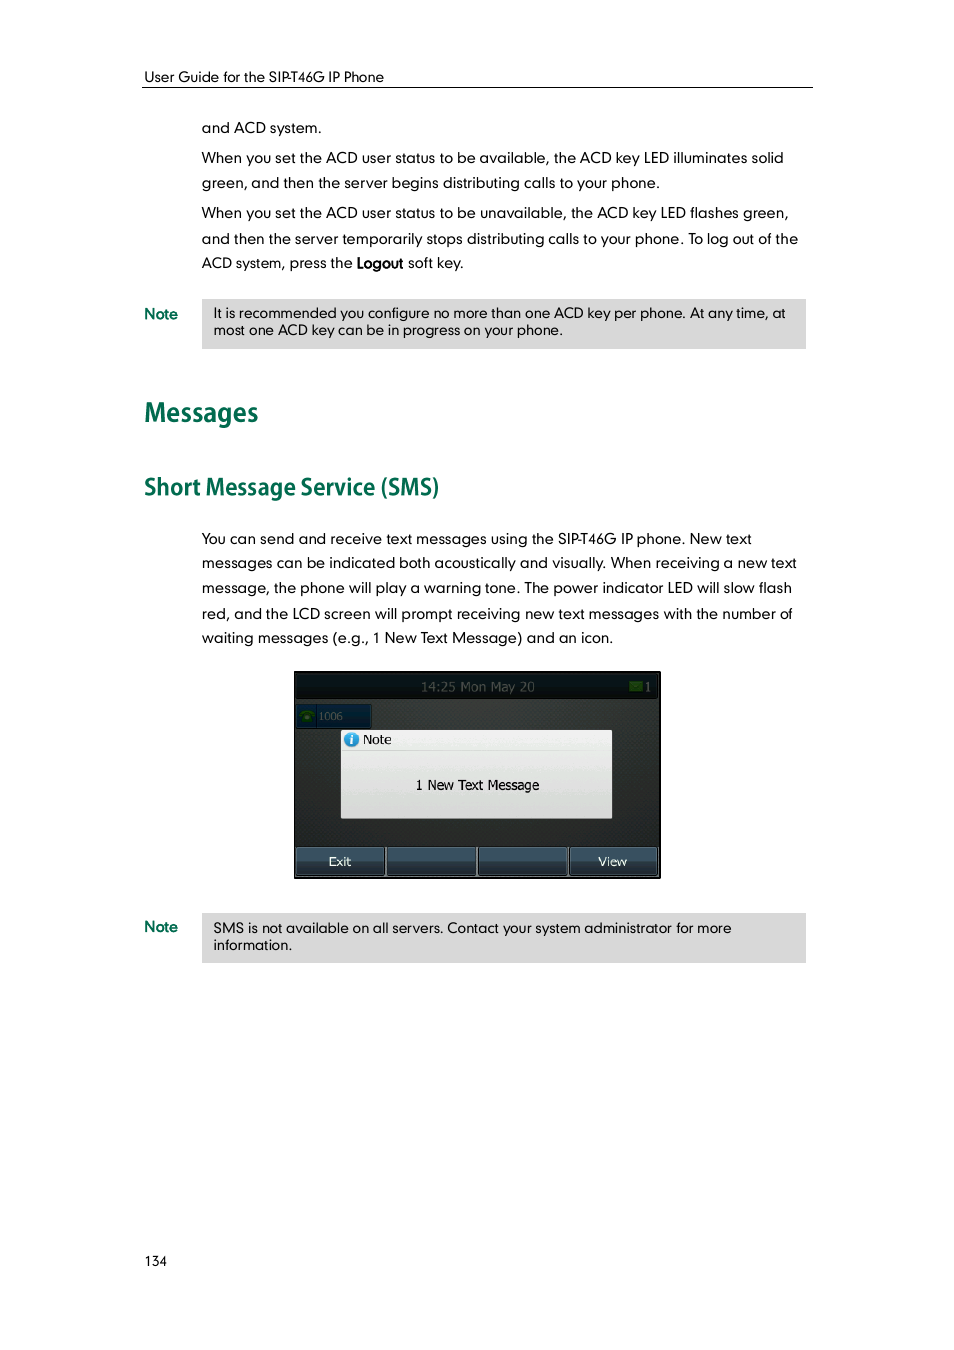 Messages, Short message service (sms) | Yealink SIP-T46G